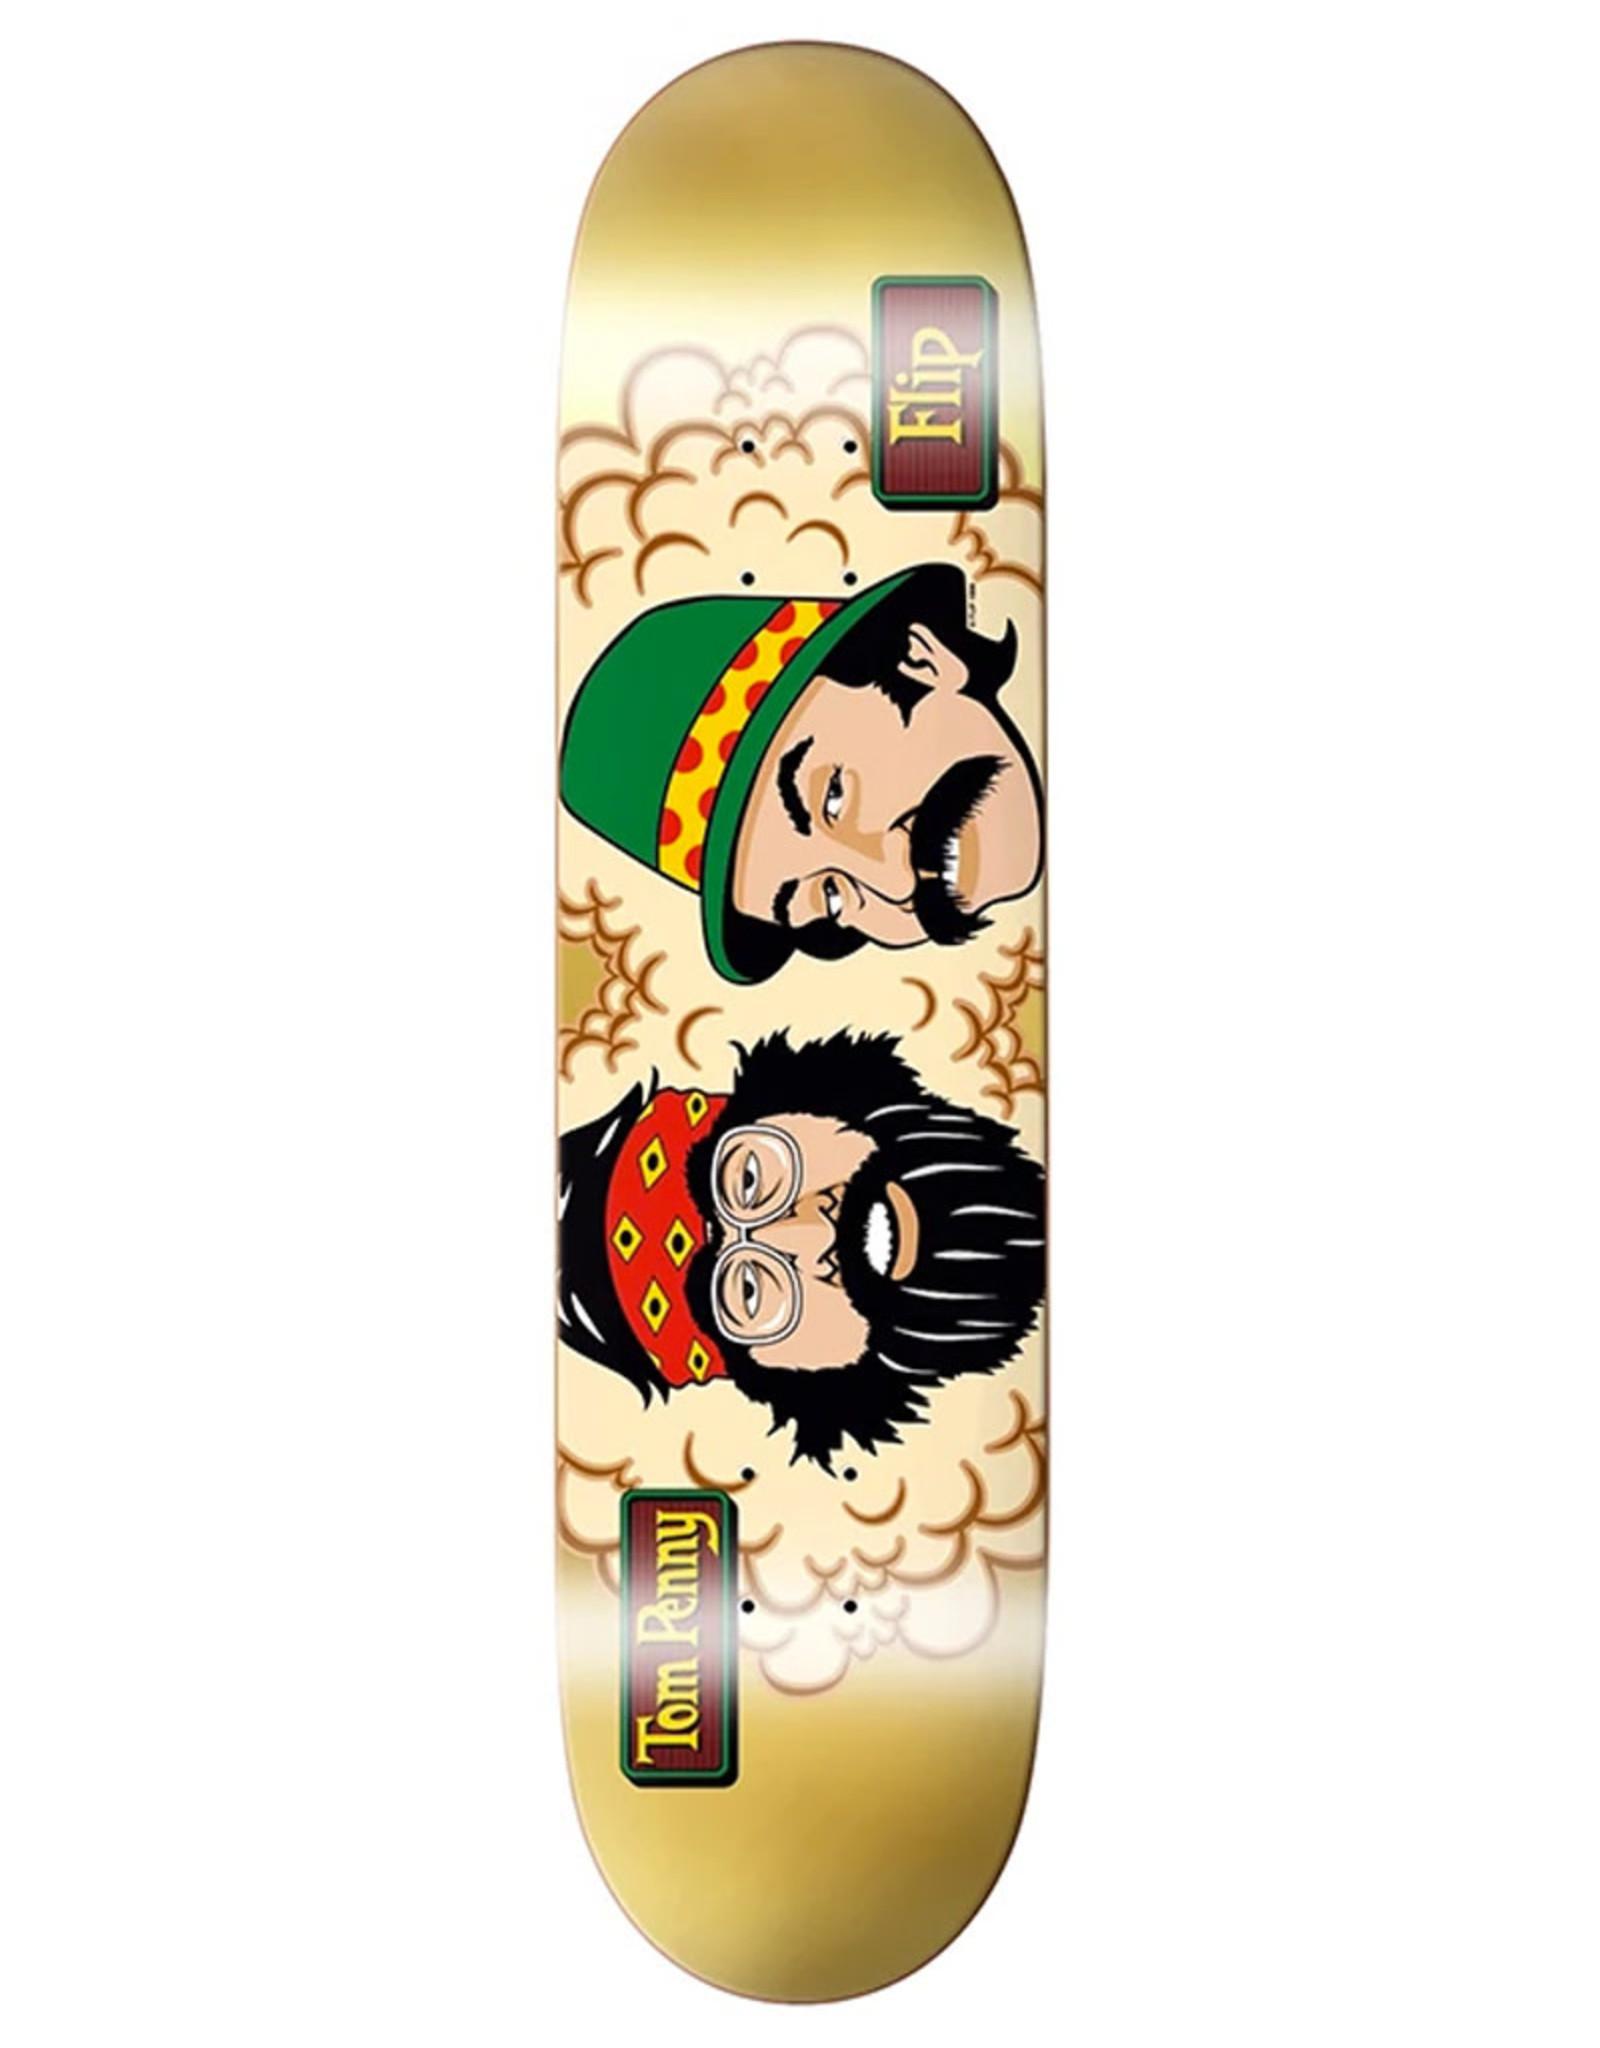 Flip Skateboards Flip Deck Tom Penny  Cheech And Chong's 50th Gold Foil (8.0)